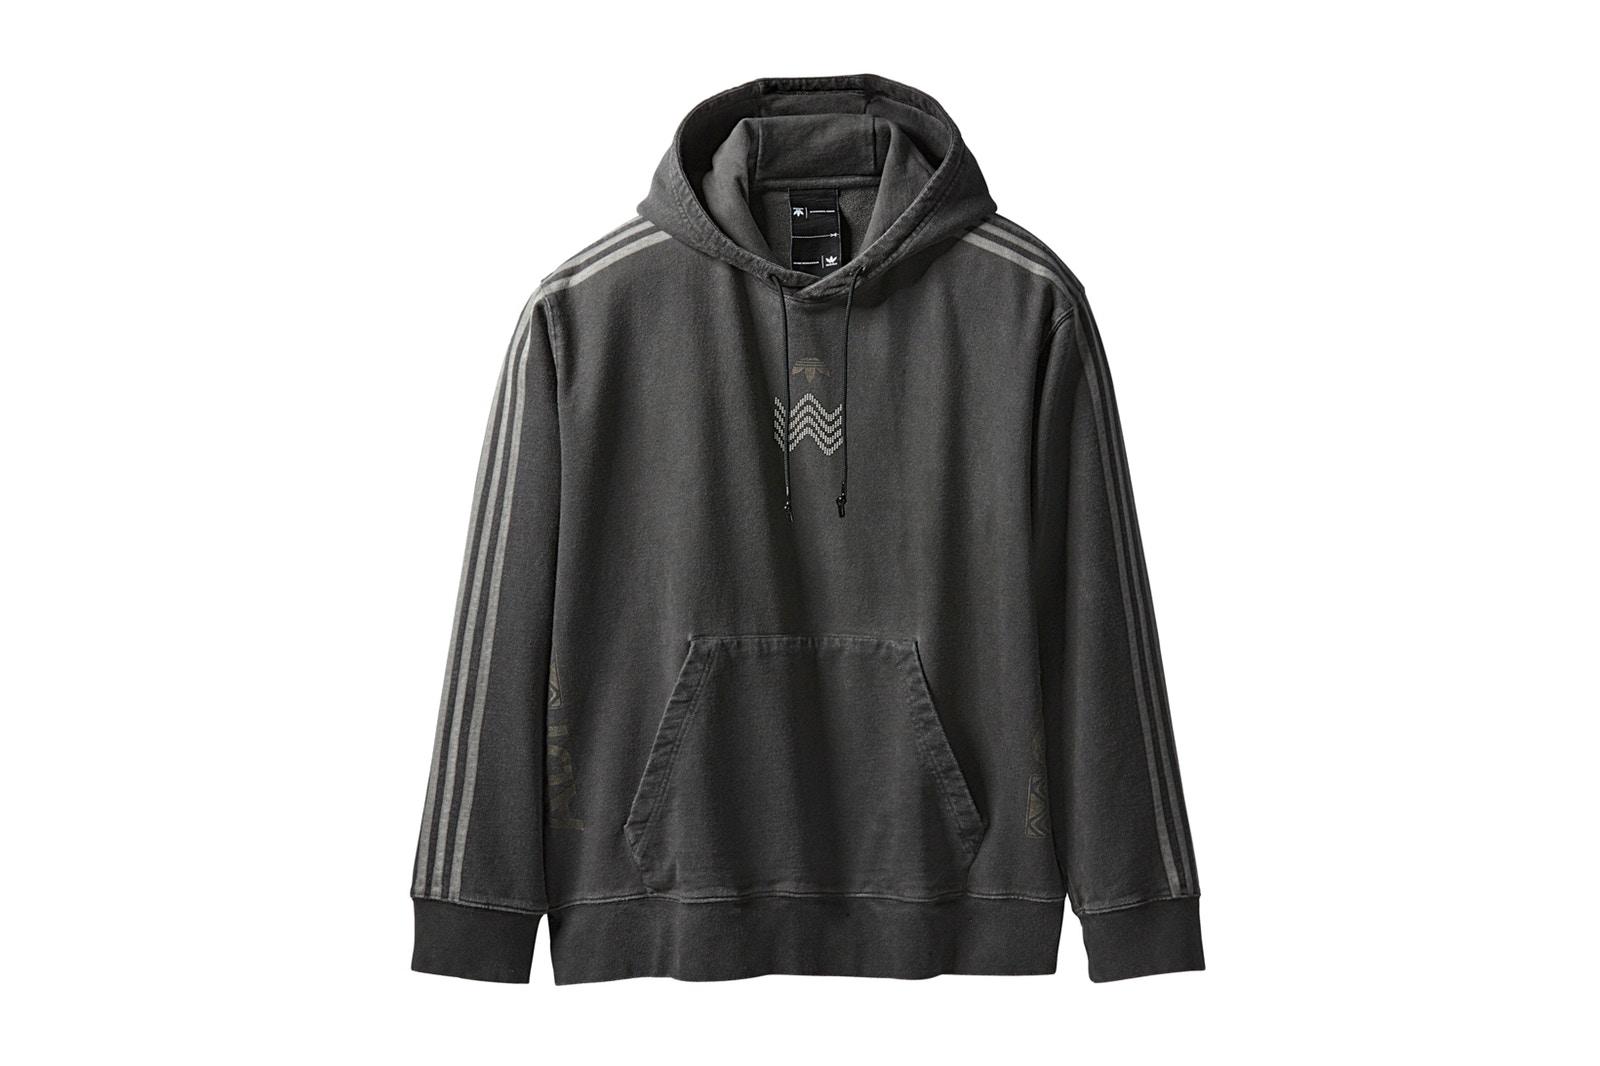 trendsperiodical adidas originals x alexander wang season 2https---bae.hypebeast.com-files-2017-07-d